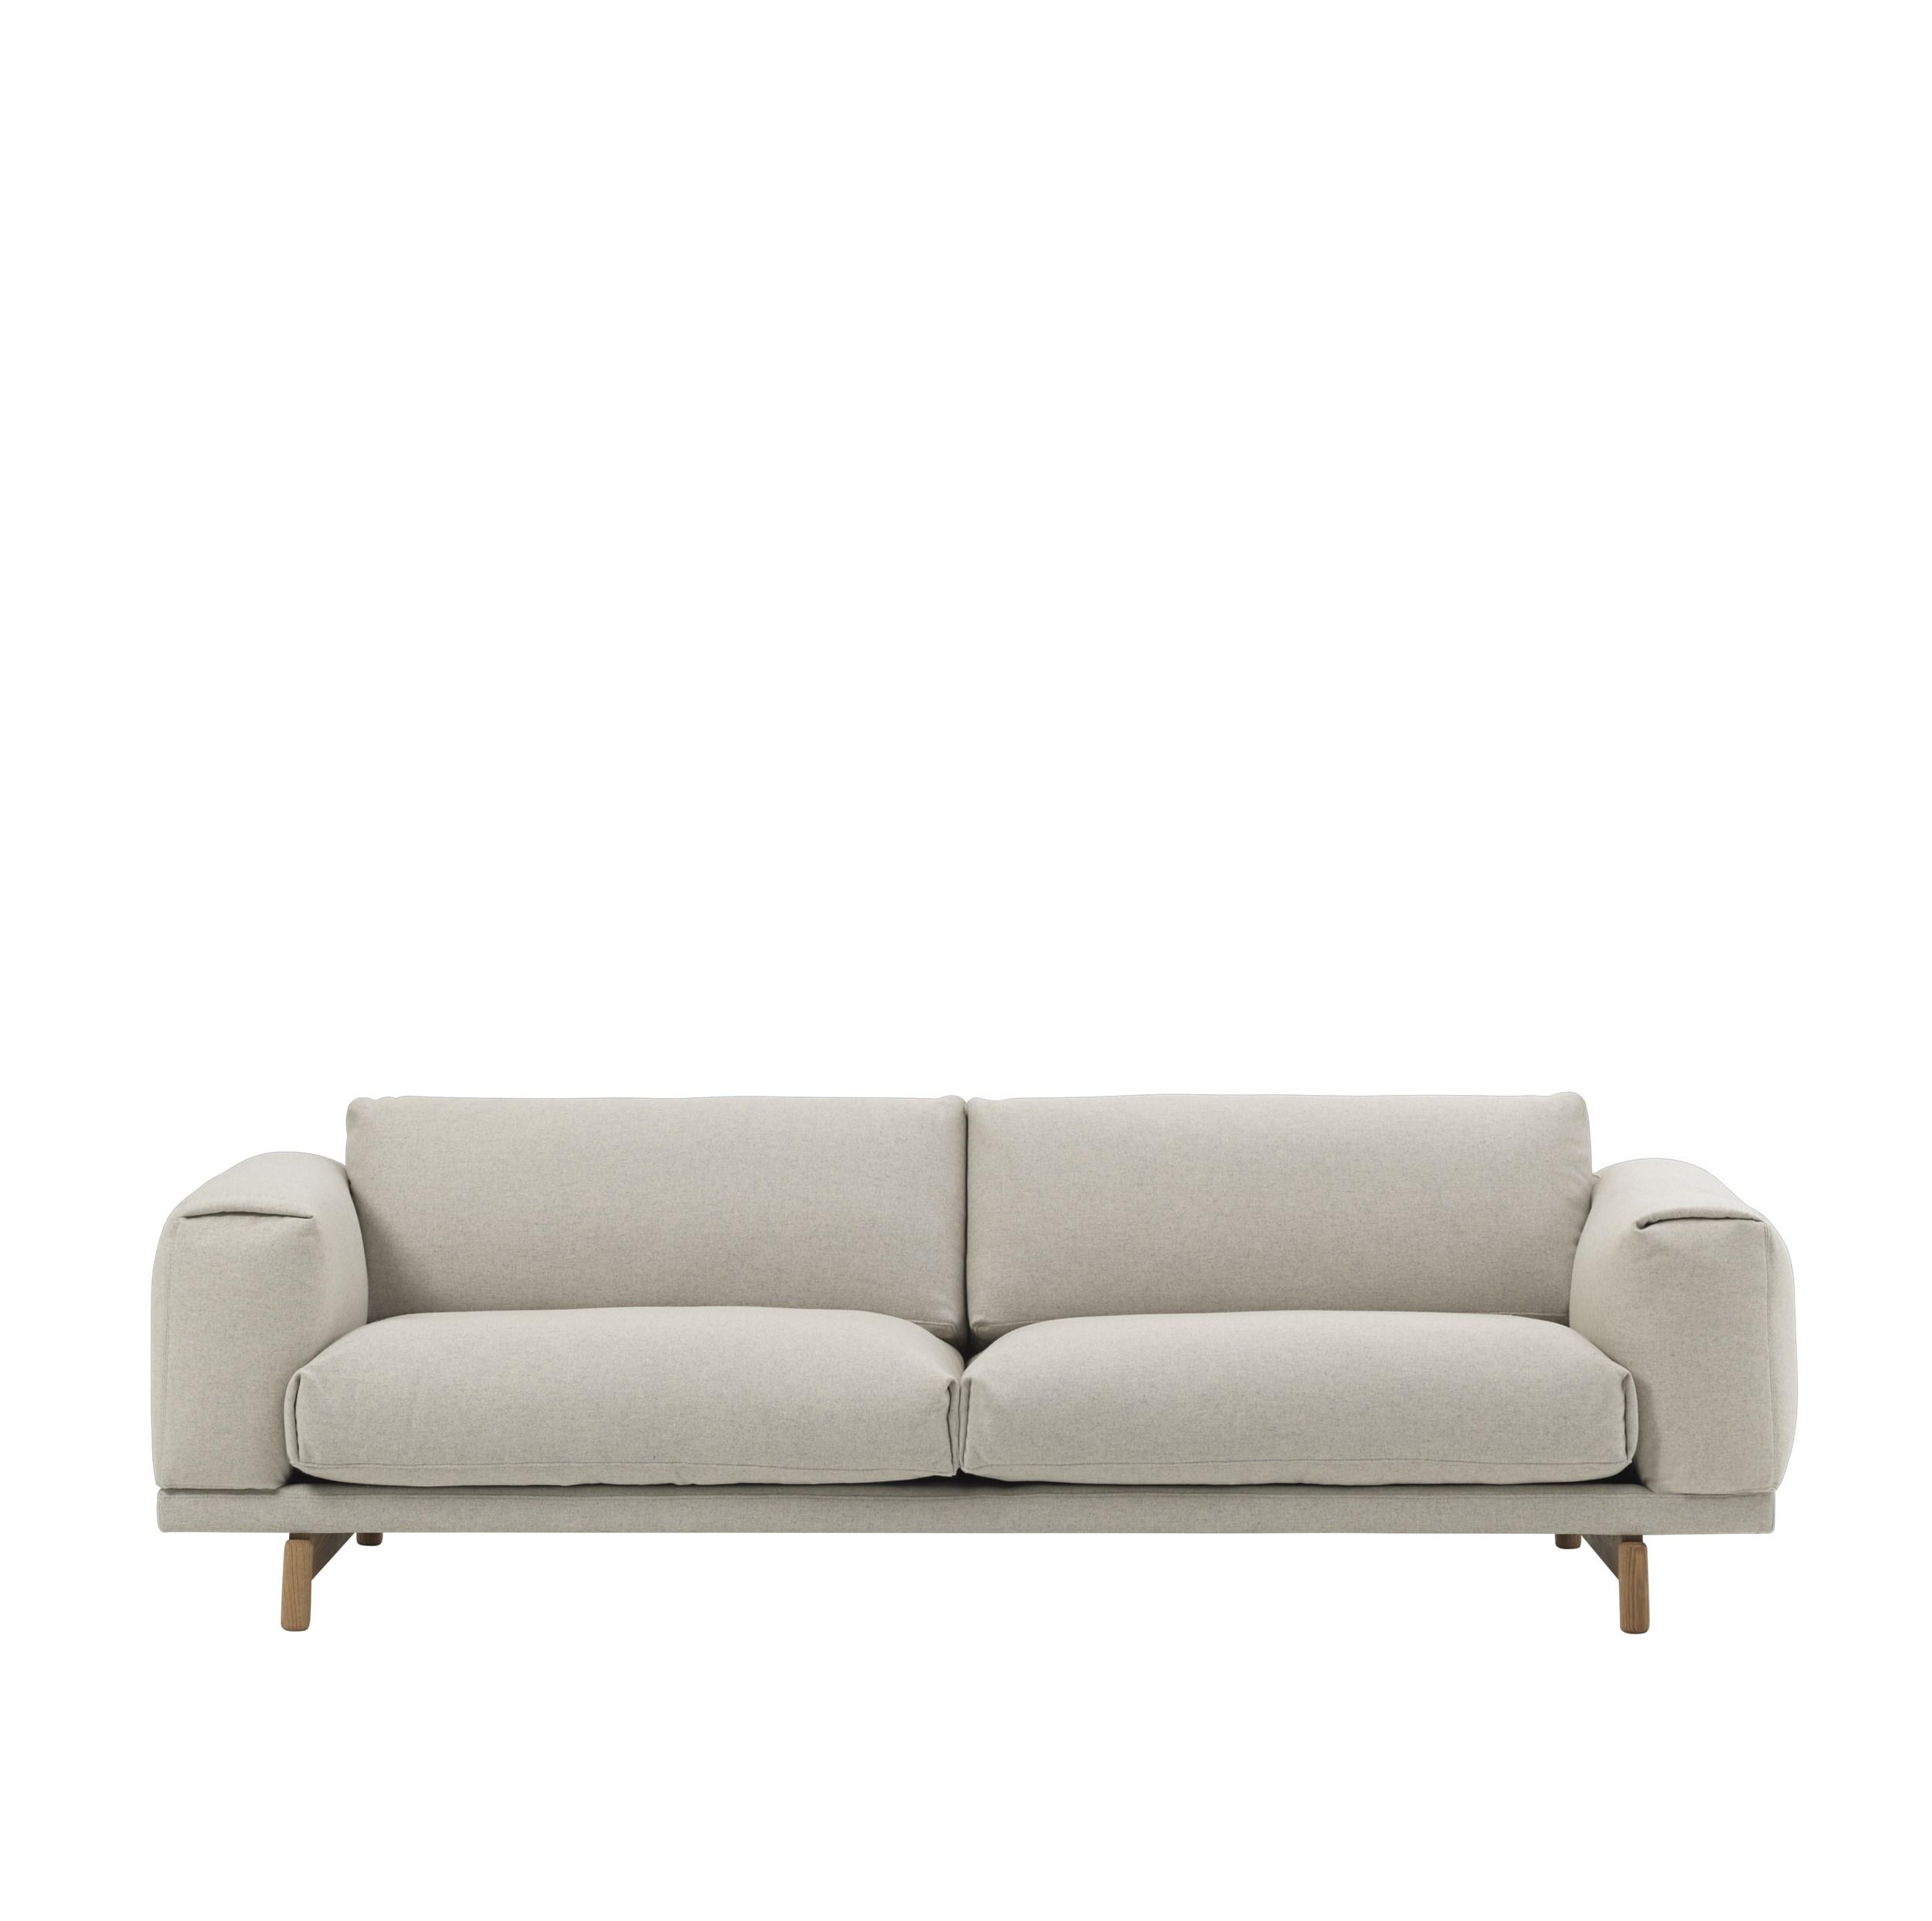 Rest Sofa 3 Seater